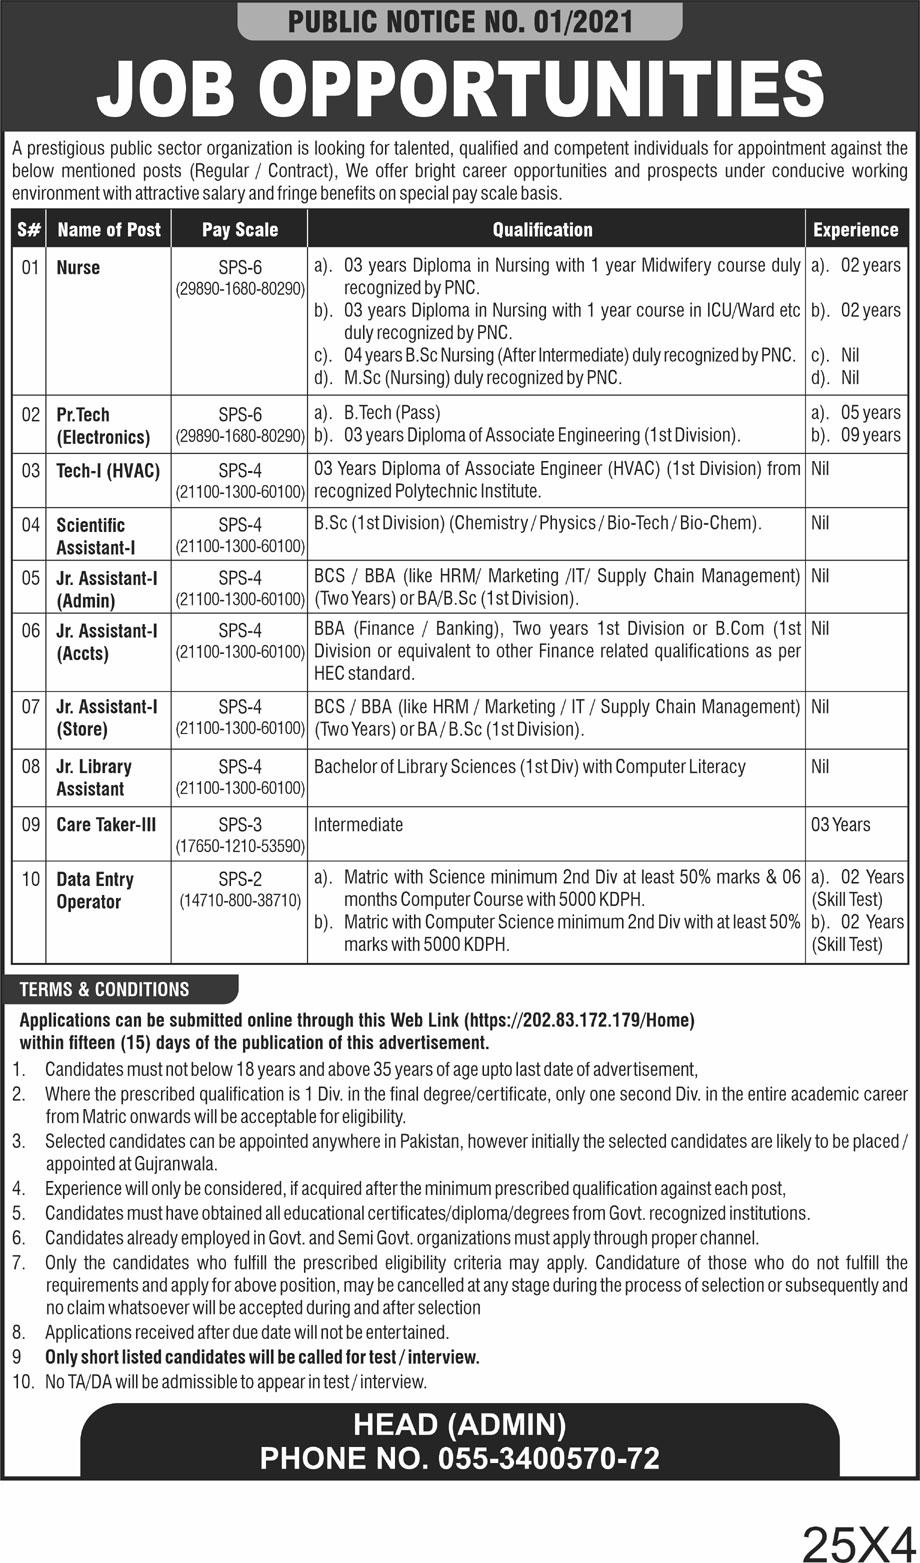 https://202.83.172.179/home-PAEC最新工作2021-www.atomicenergy.pk工作-PAEC工作2021-巴基斯坦原子能委员会工作2021-www.paec.gov.pk工作-PAEC在线申请-PAEC工作2021在线申请-PAEC最新职位2021